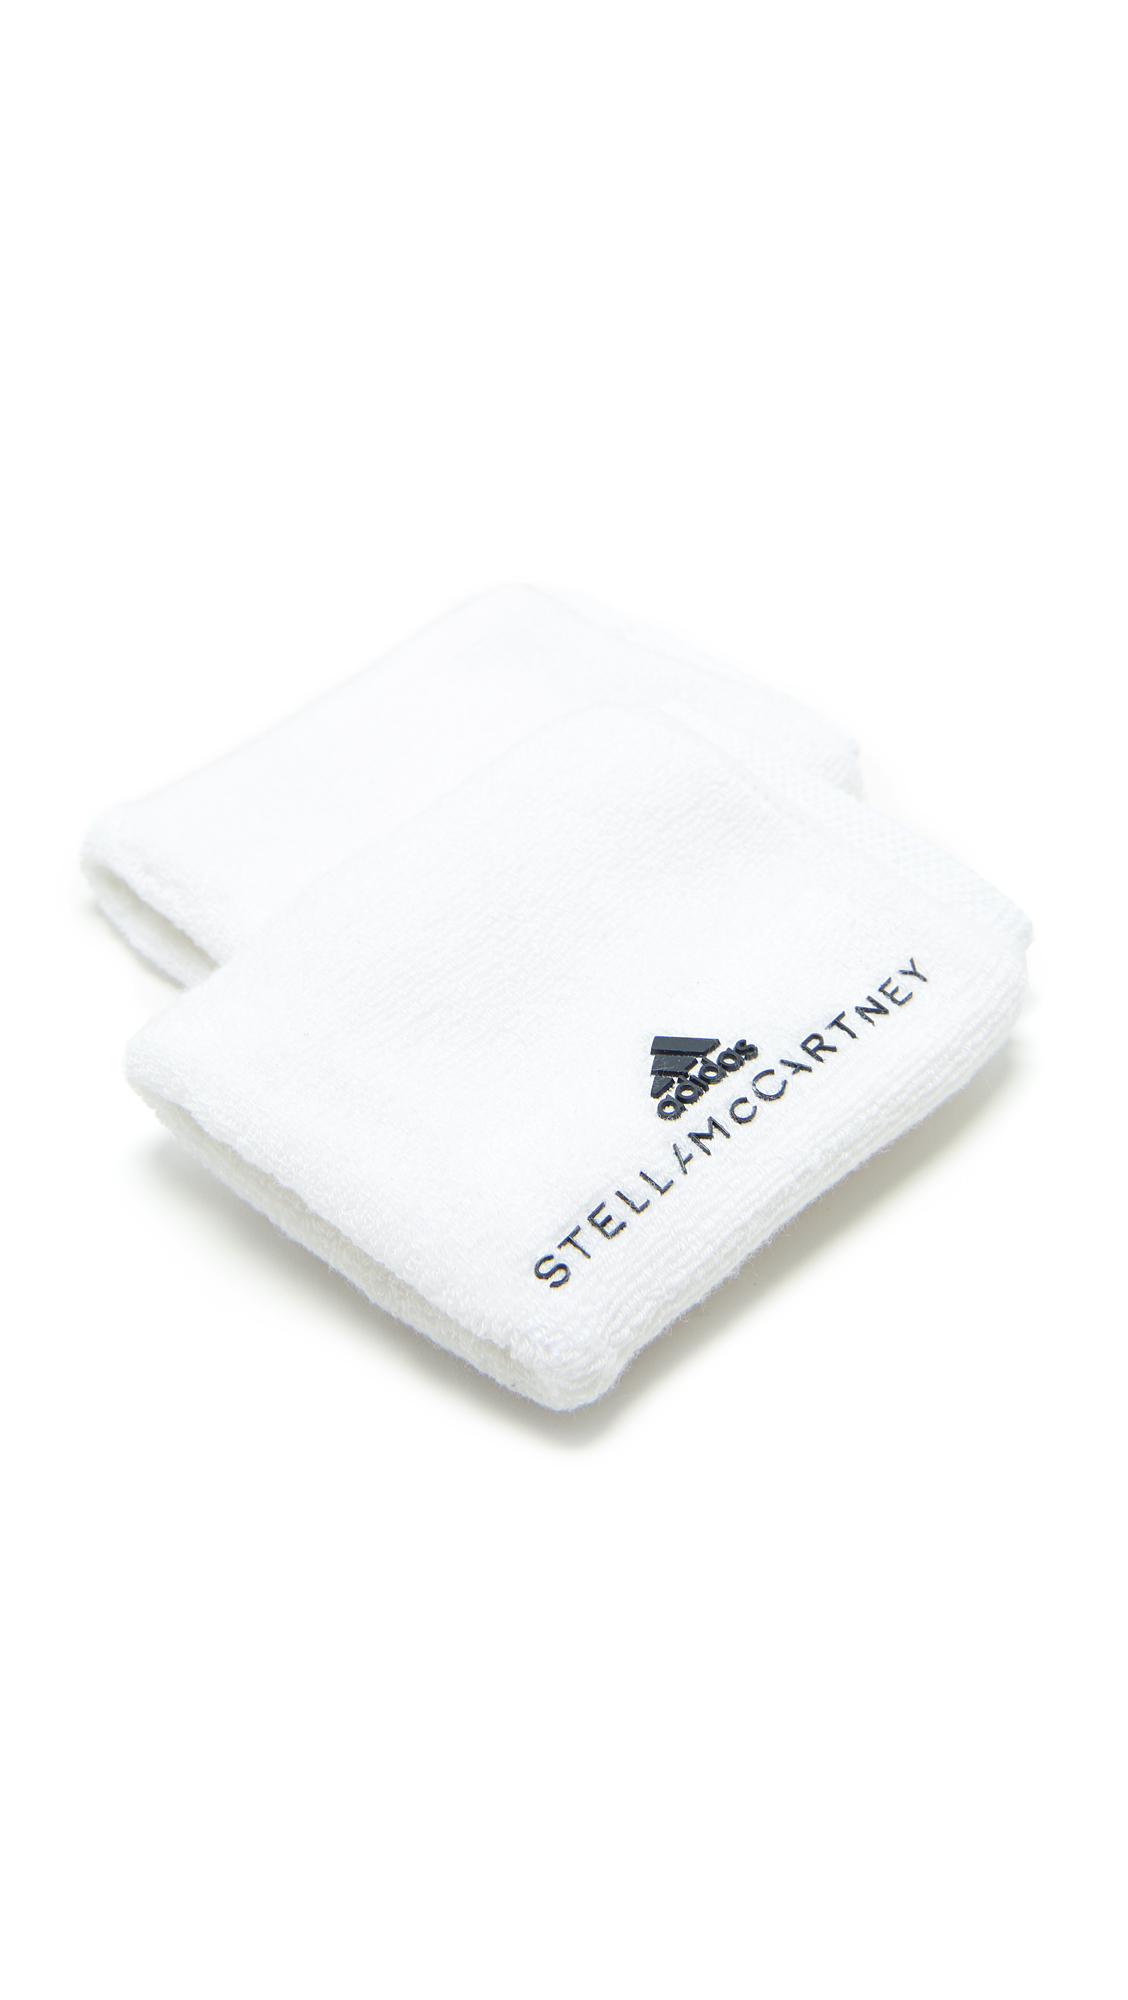 adidas by Stella McCartney Wristbands - White/Legend Blue